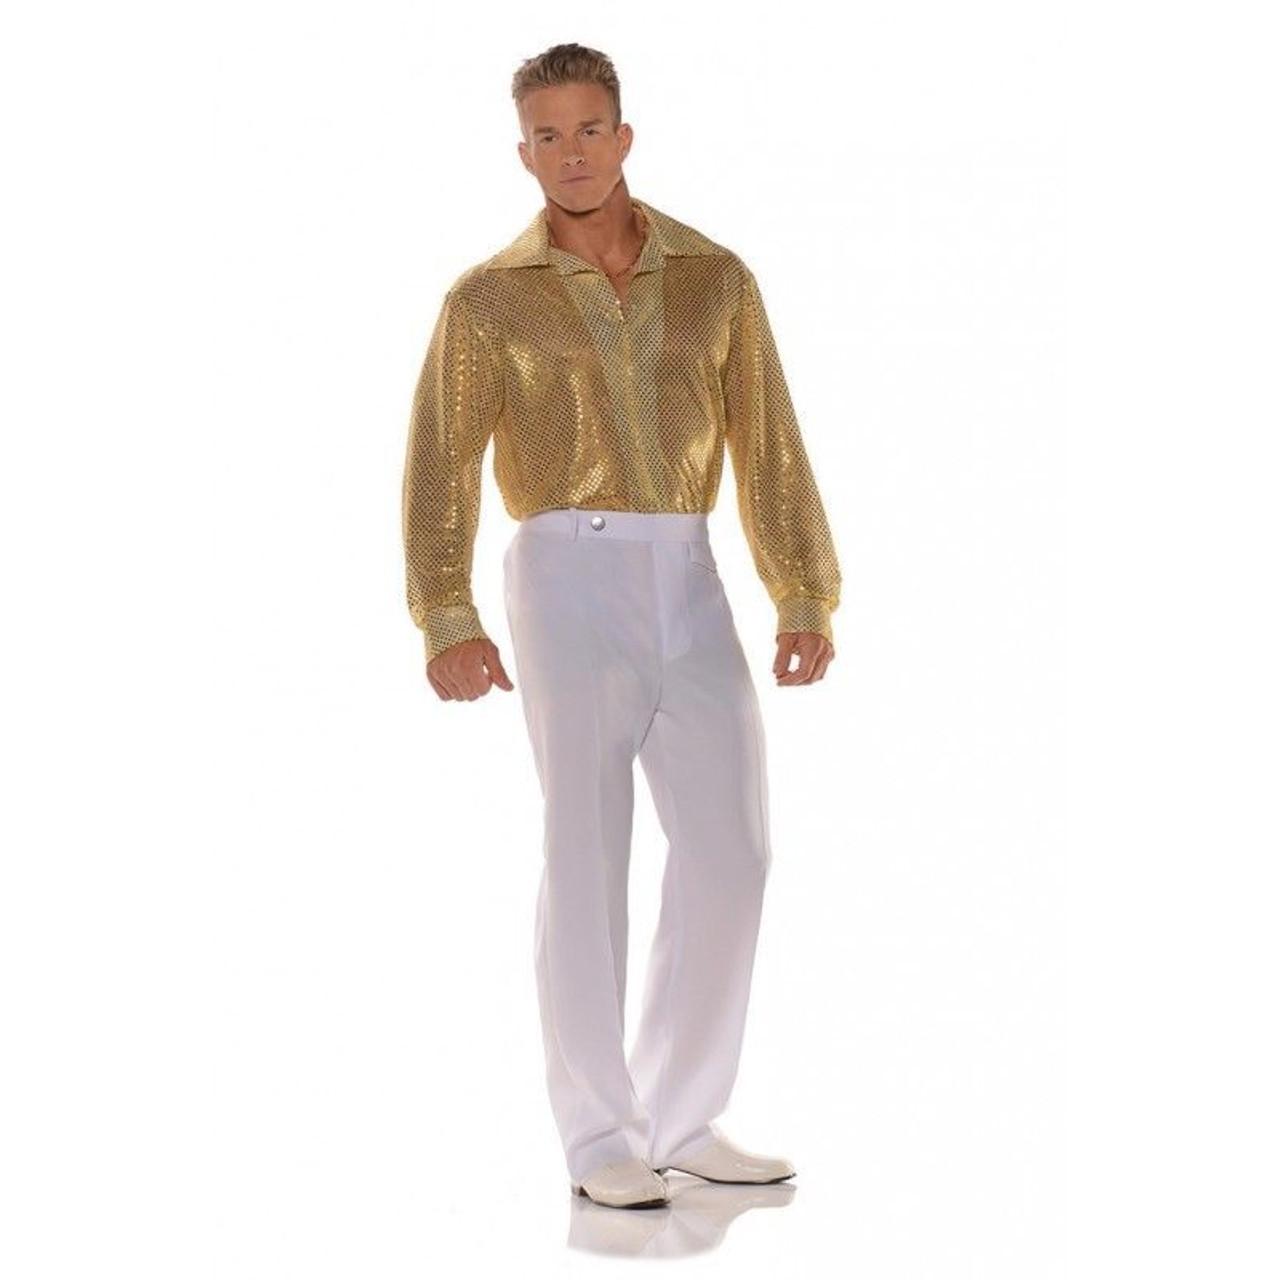 bac6c1f7b8d8e7 Underwraps Gold Sequin 70's Disco Shirt Adult Mens Halloween Costume 28591